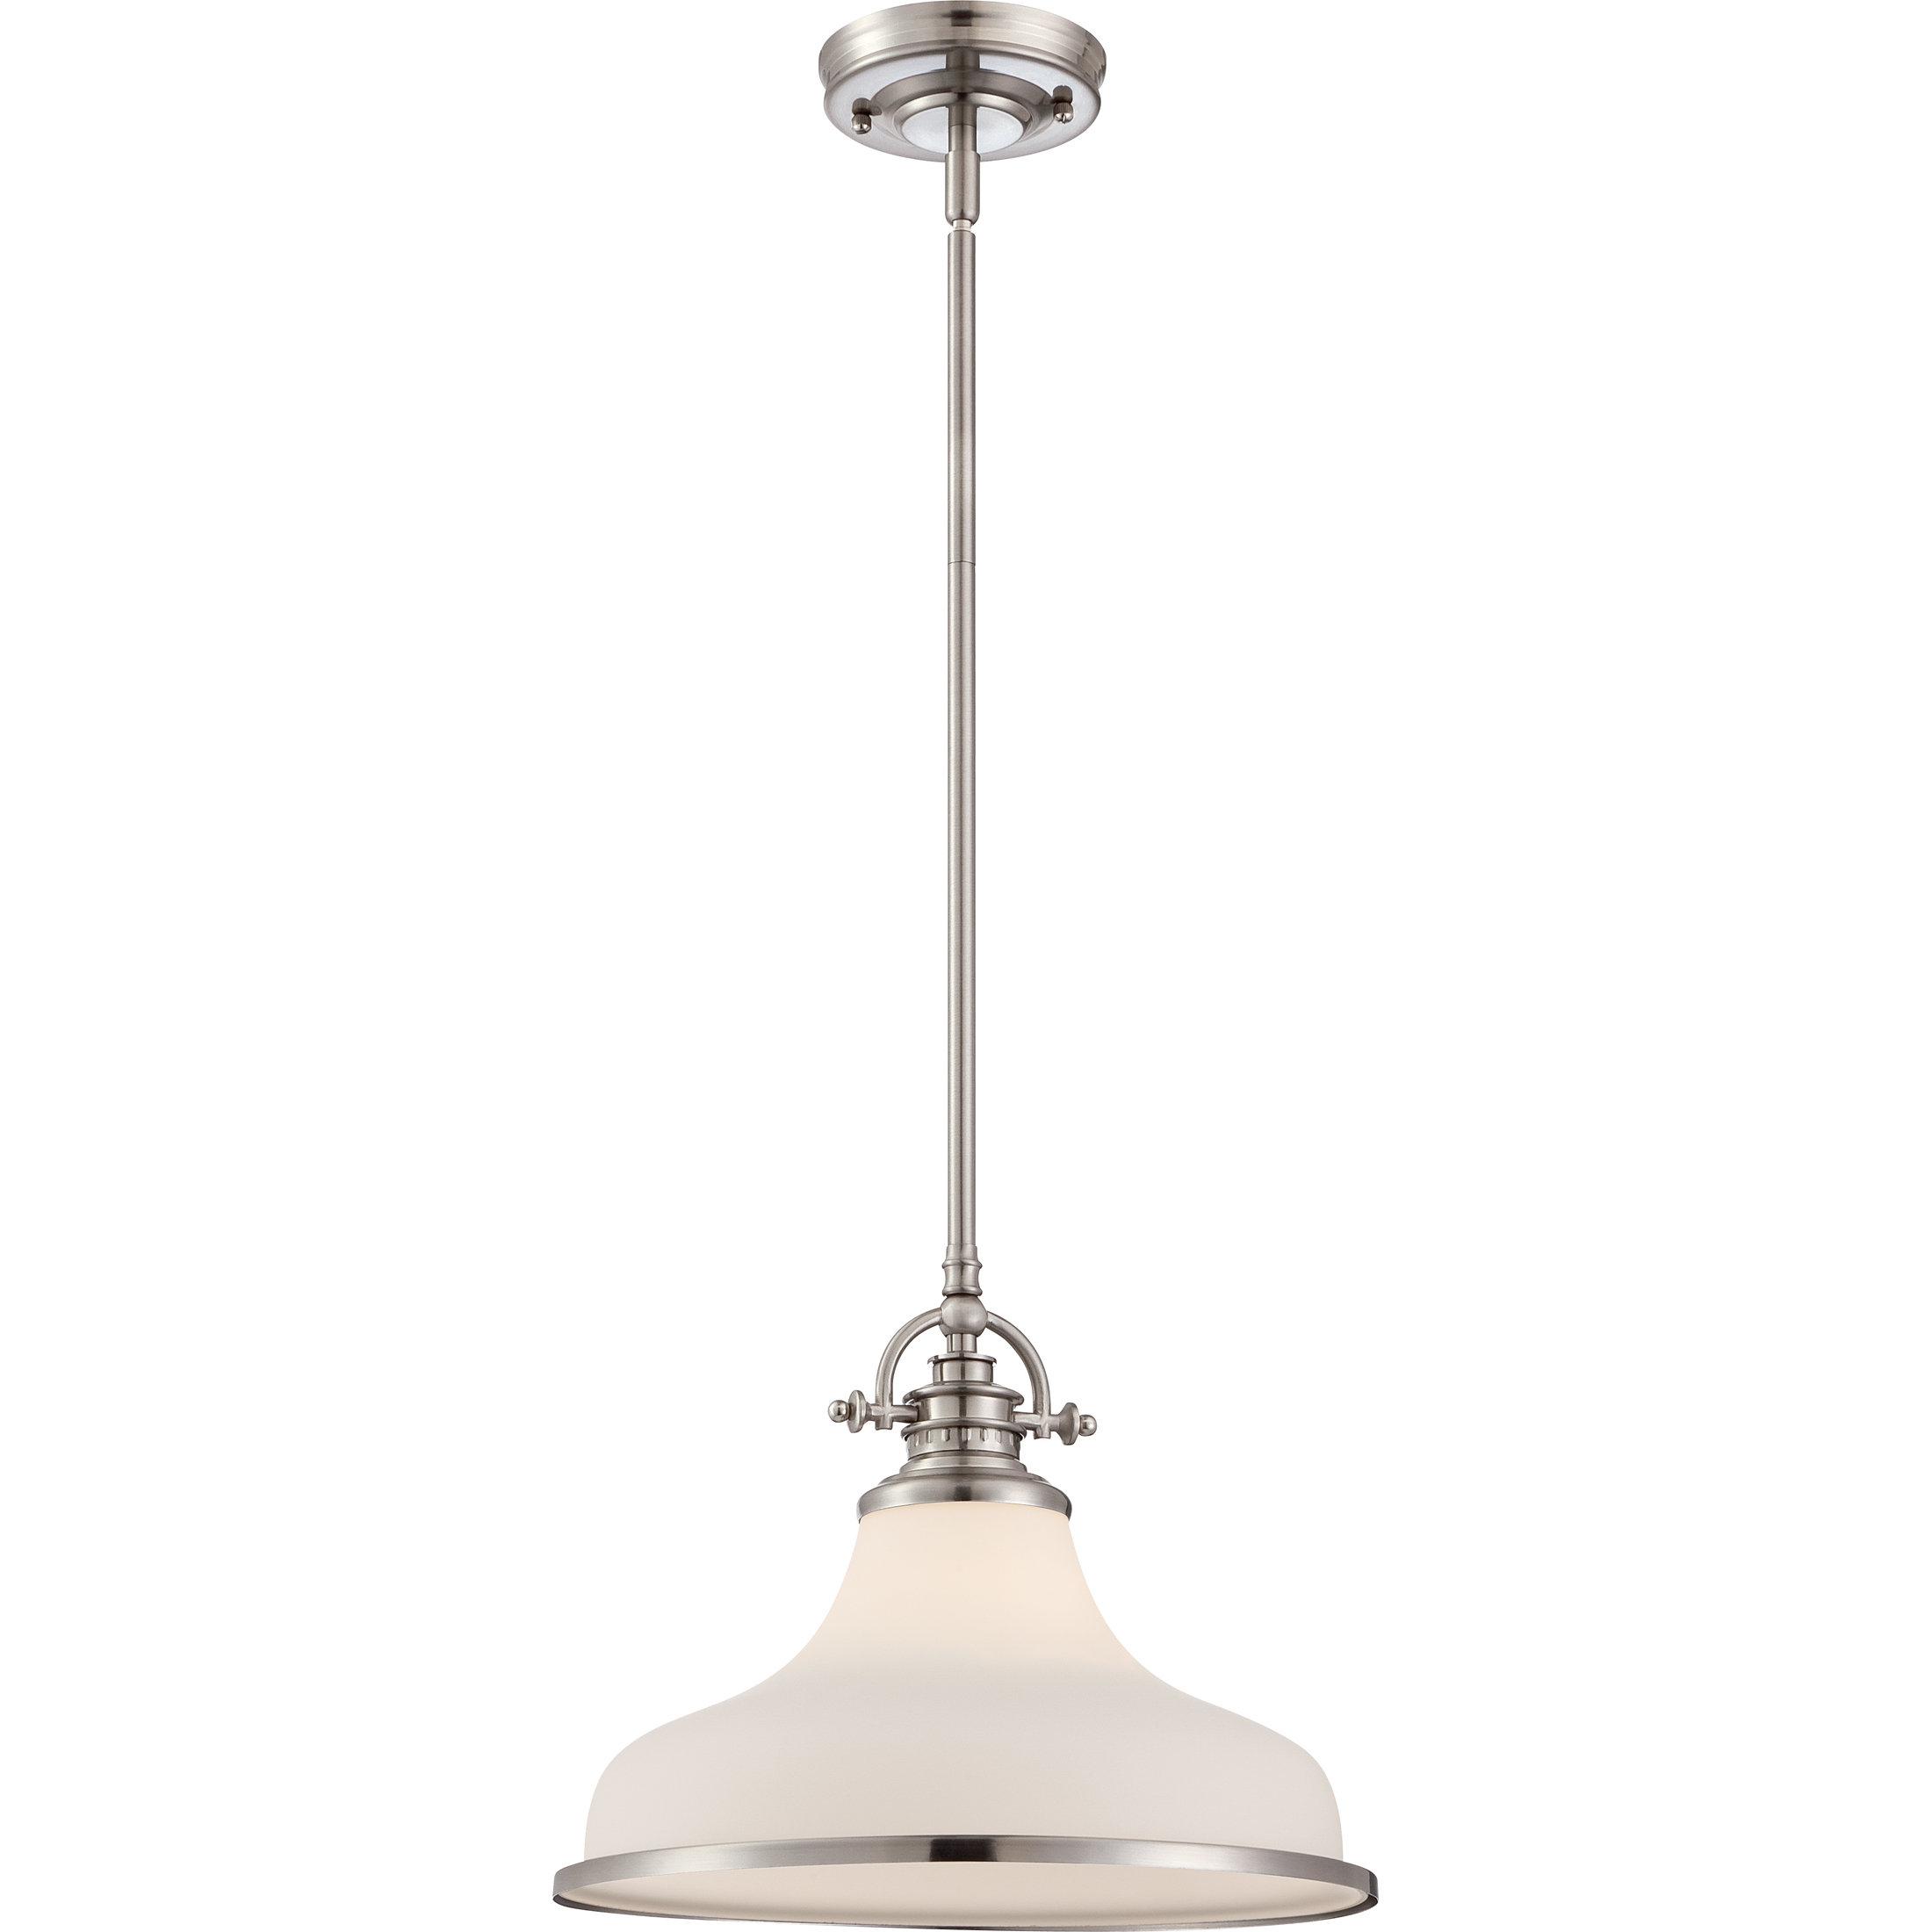 Miltiades 1 Light Single Dome Pendant With Regard To Mueller 1 Light Single Dome Pendants (View 18 of 30)